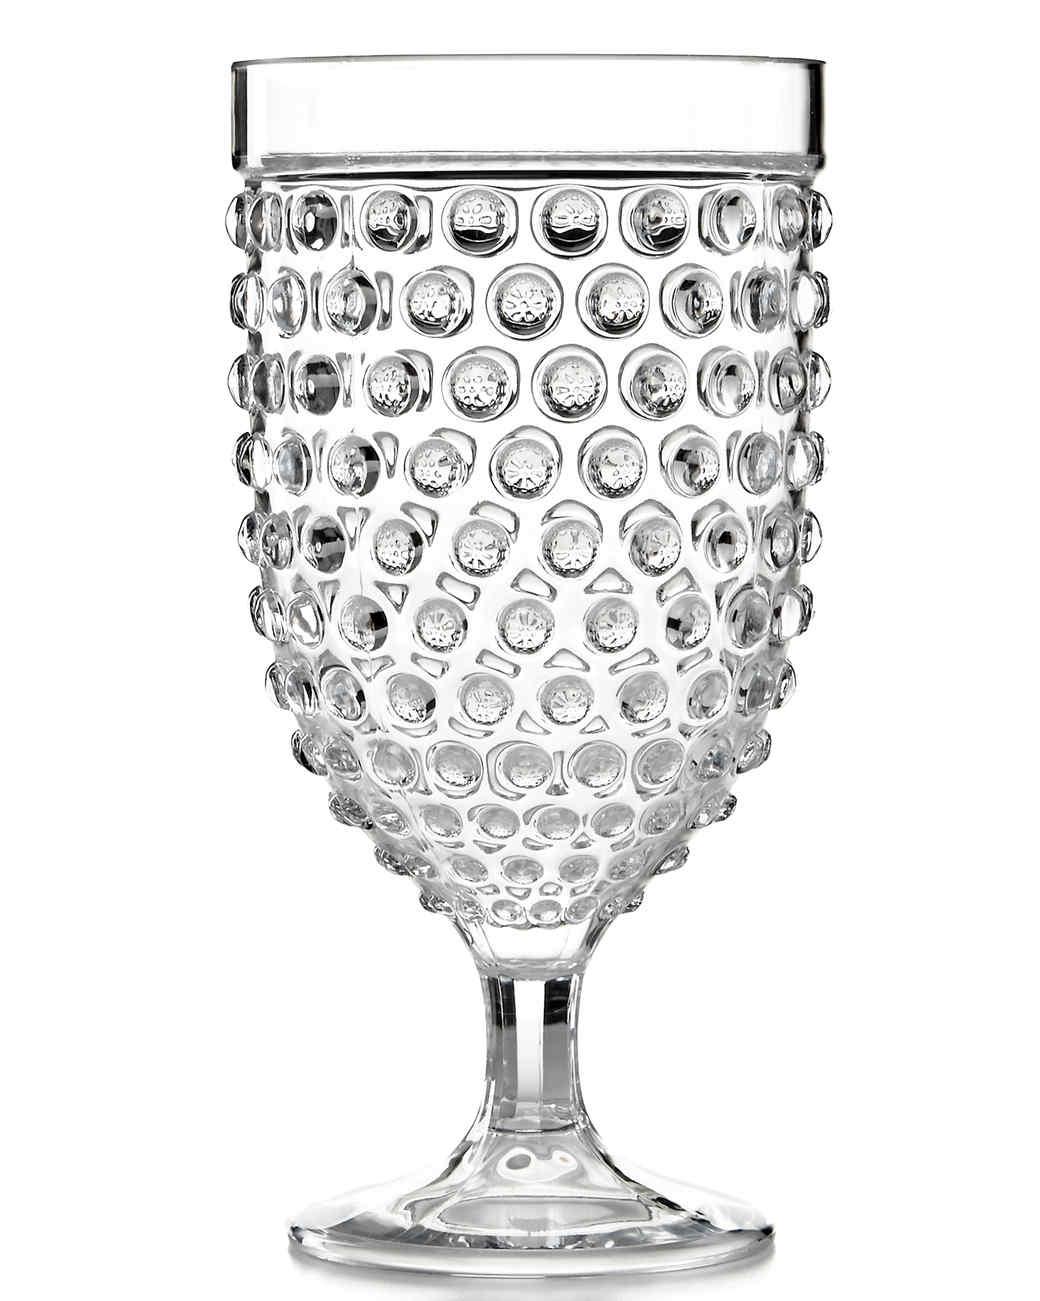 msmacys-plastic-wineglass-mrkt-0514.jpg